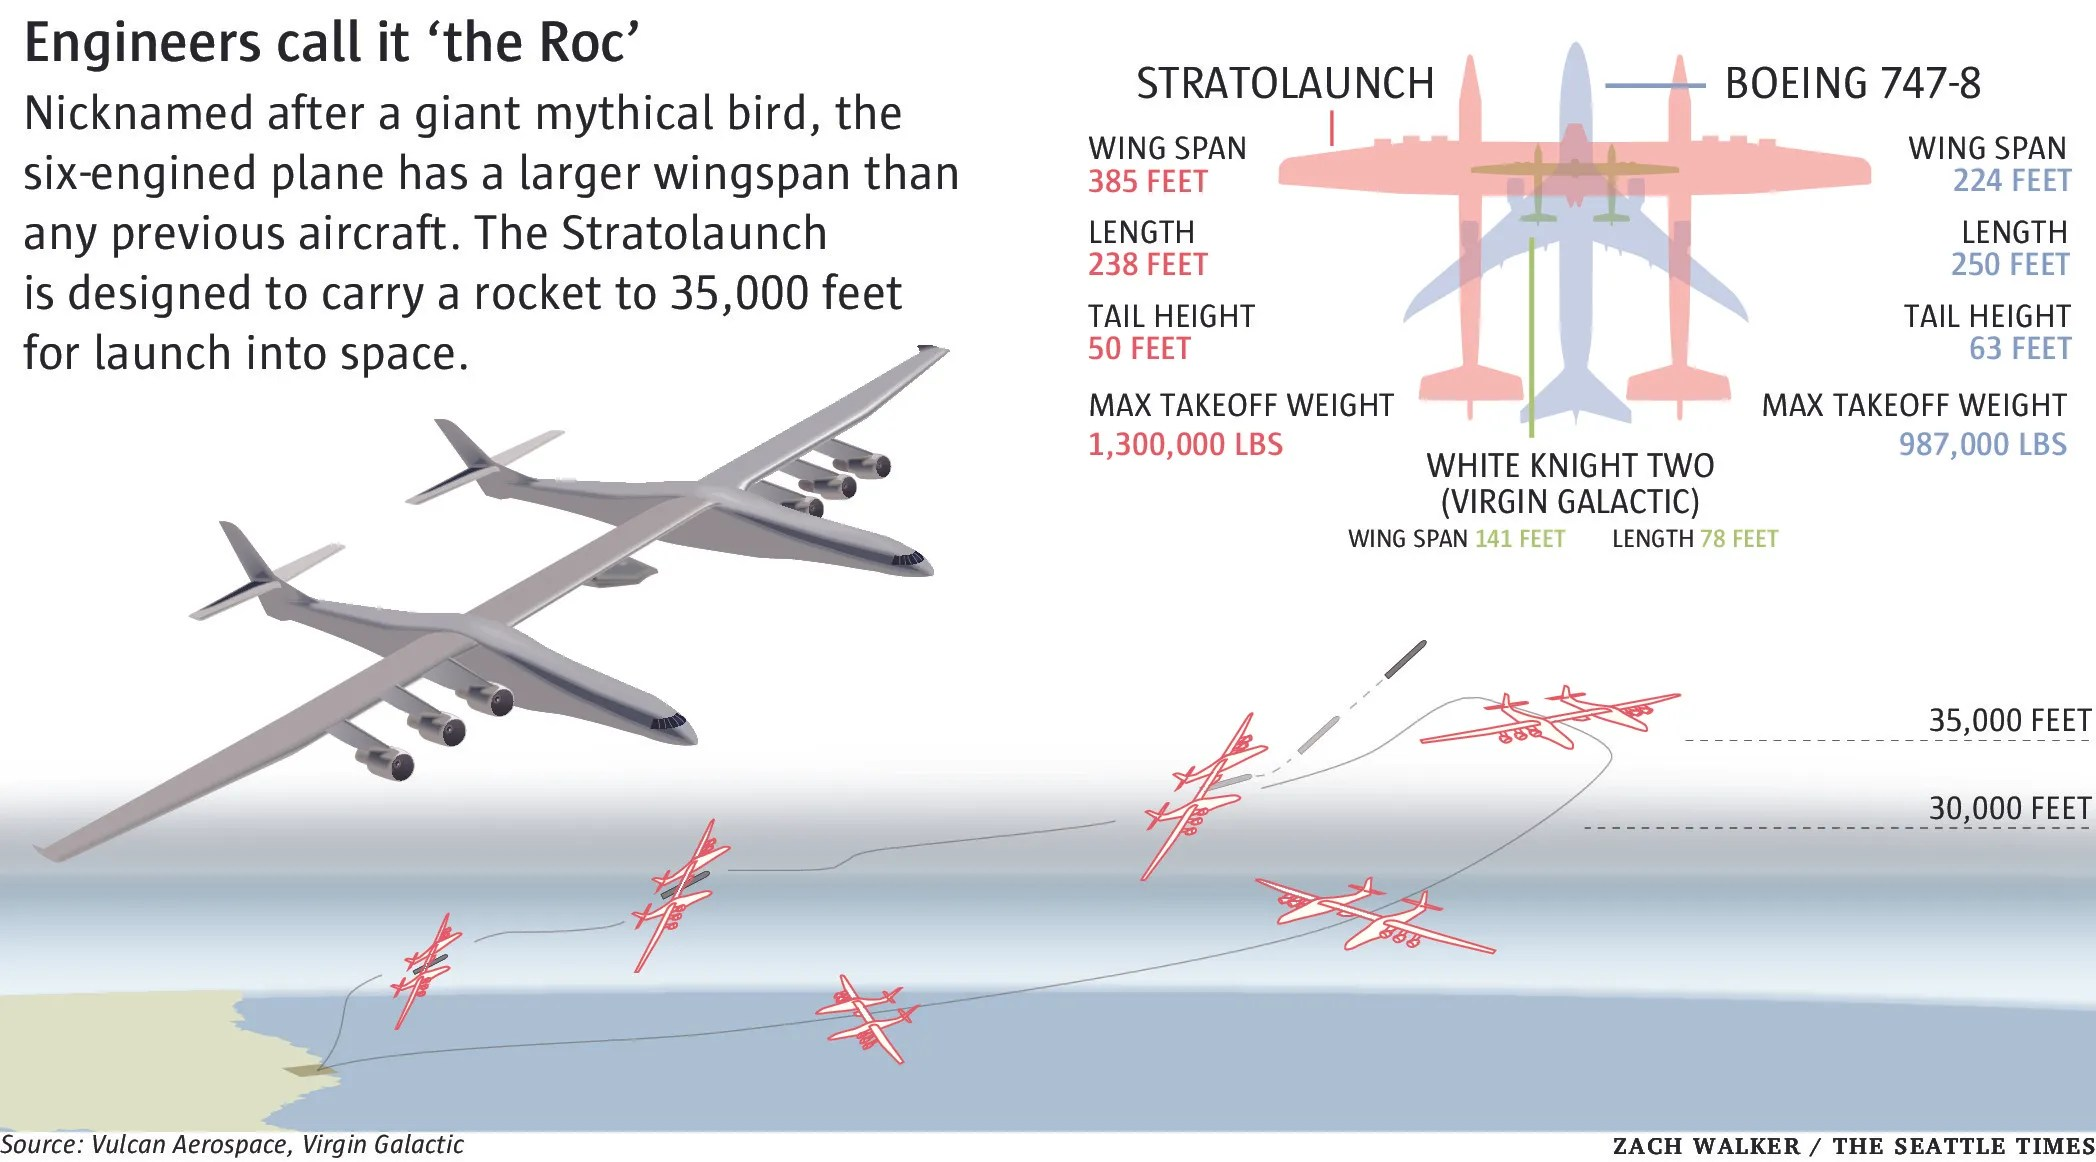 Paul Allen\u0027s giant plane takes shape in the desert, but its market